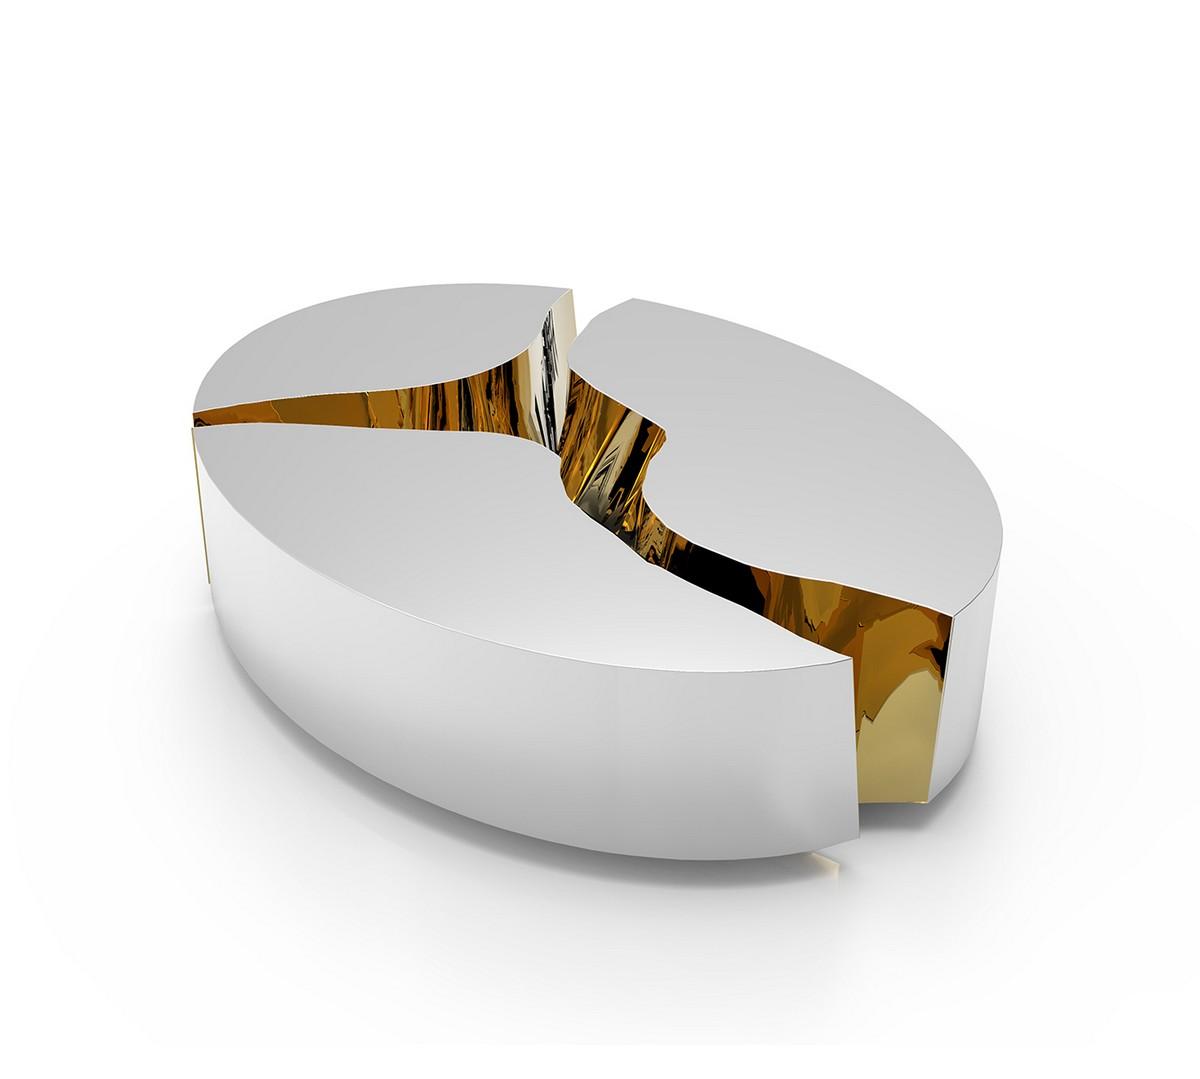 boca do lobo, living room, center table, luxury piece, unique, interior design, gold, richness, ambiances, glamorous, excellence, details, home decor, bold